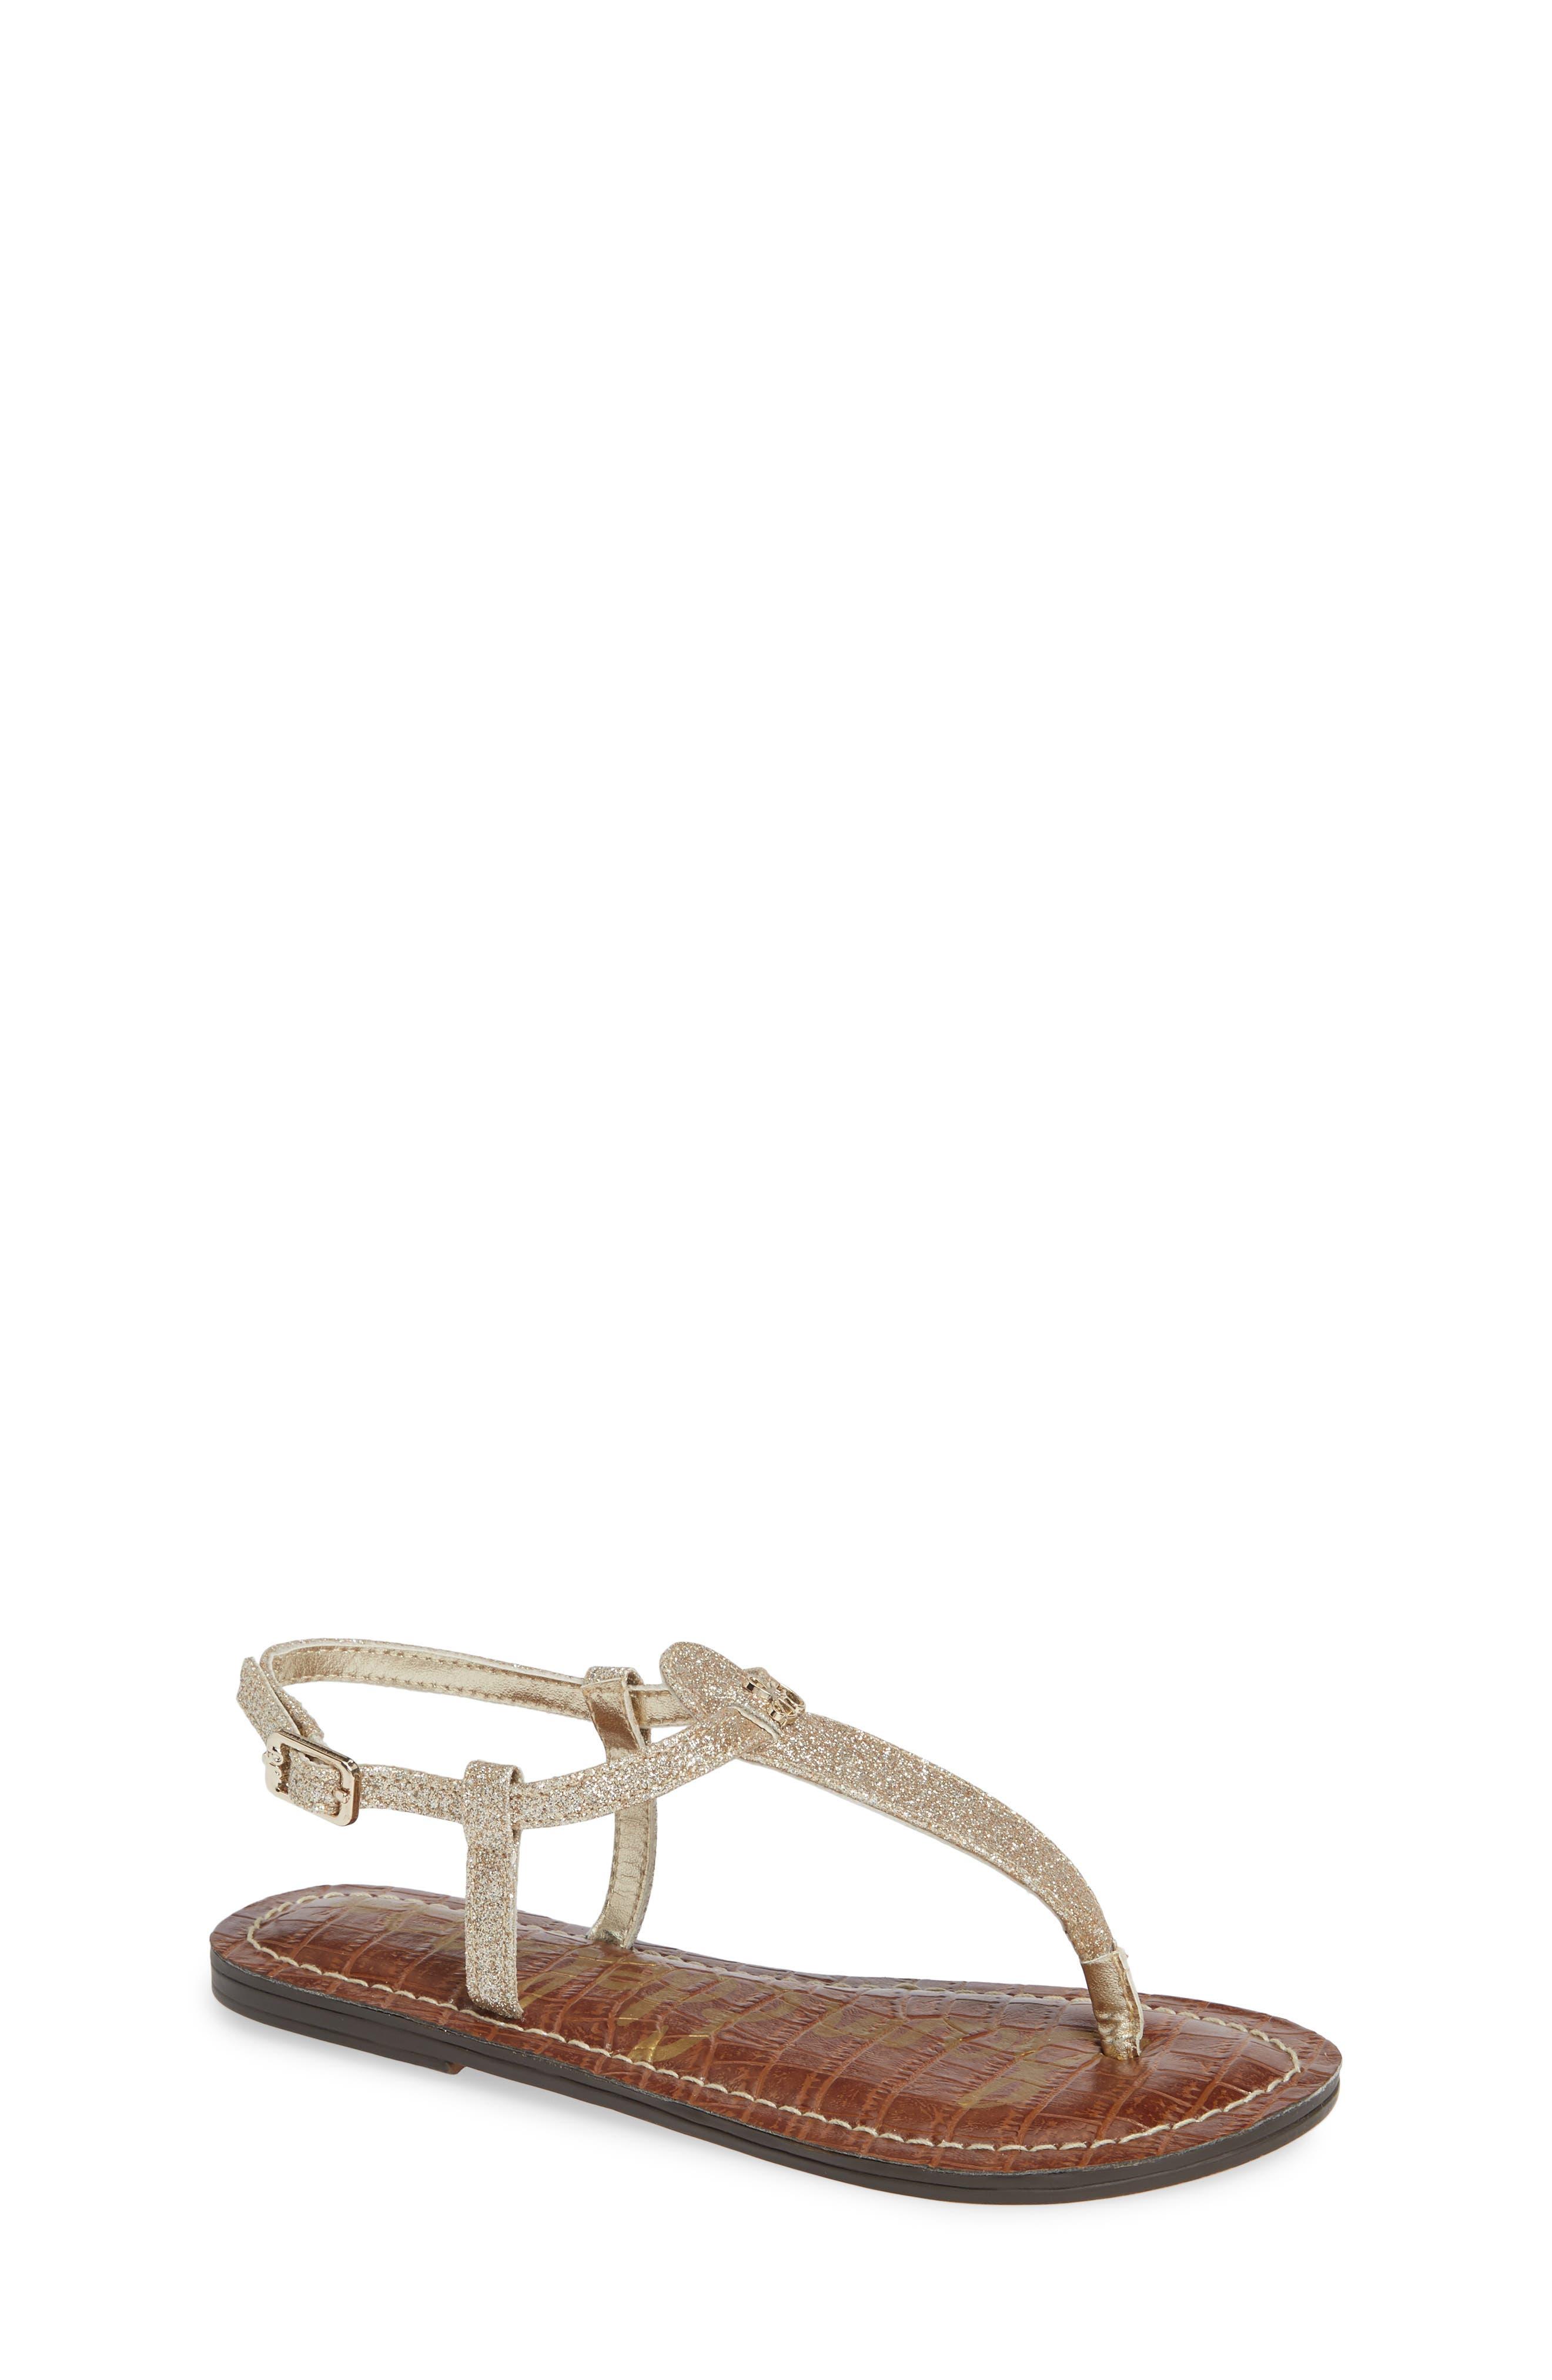 Girls' Sam Edelman Sandals \u0026 Flip-Flops